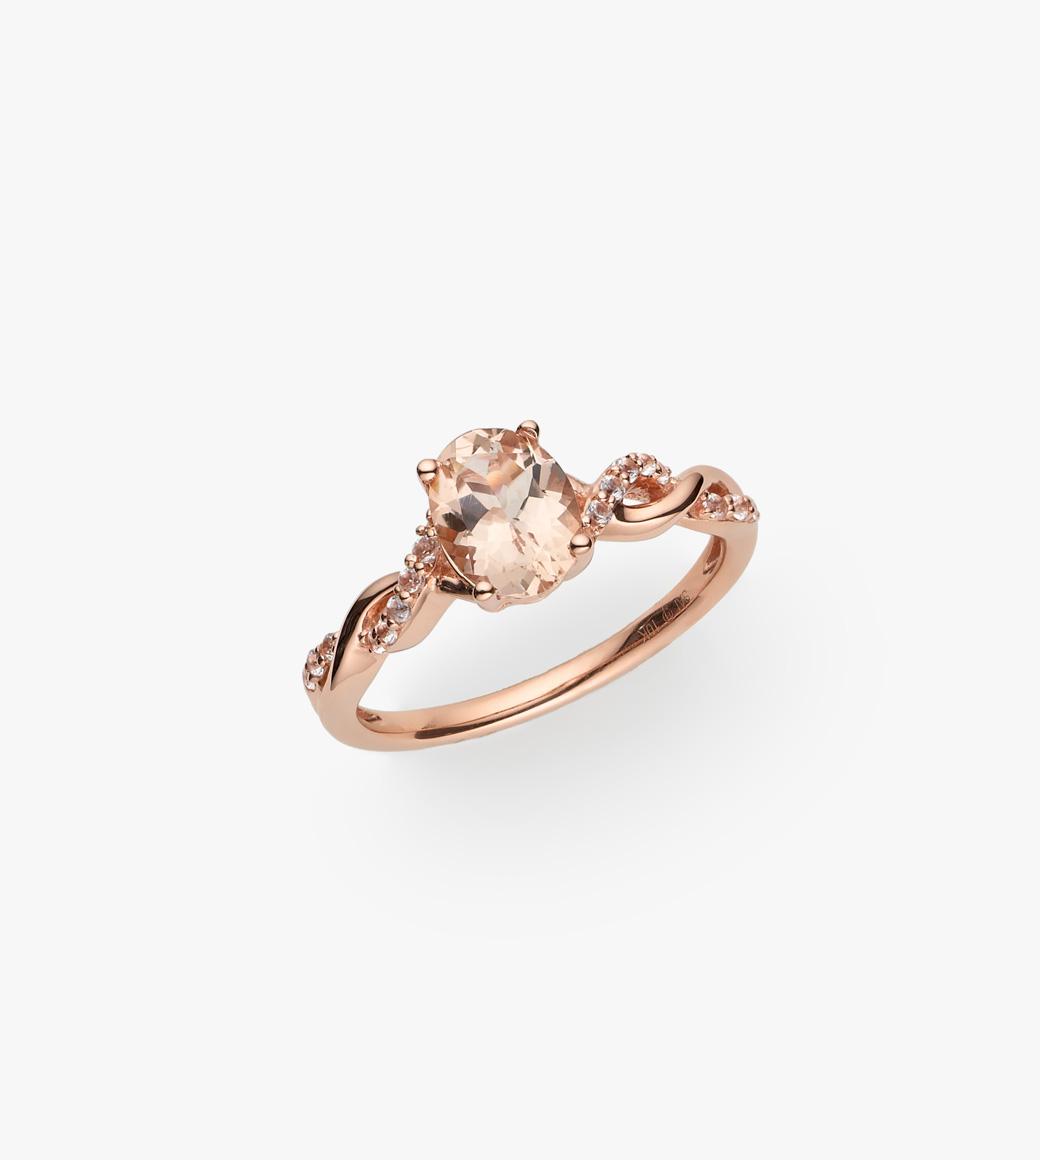 b ie UTF8&node wedding rings under Commitment Jewelry